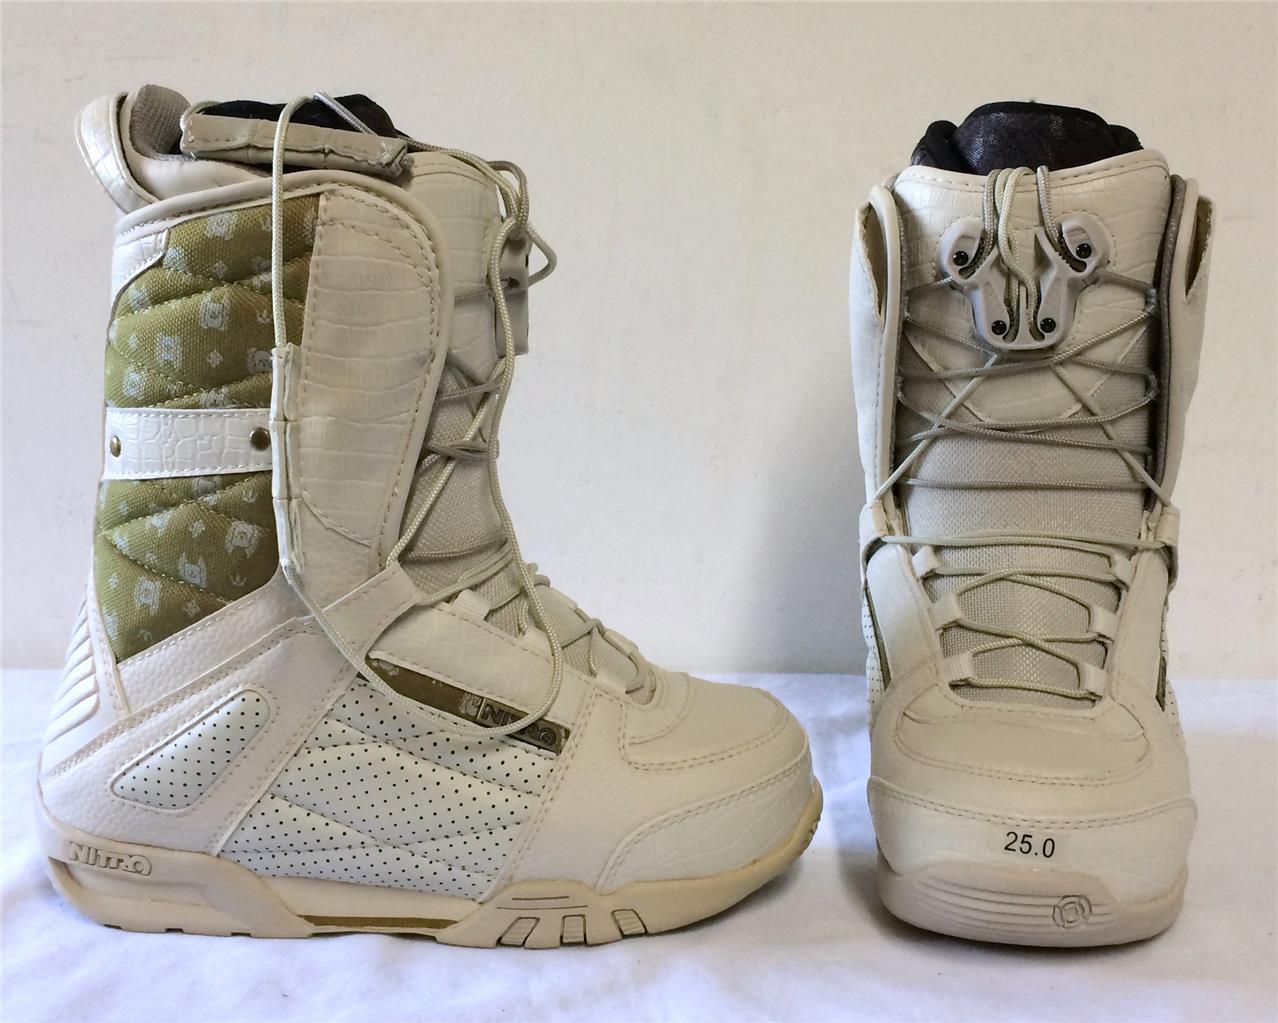 Nitro Crown Womens Snowboard  Boots Bone 5.5 NEW  fashionable